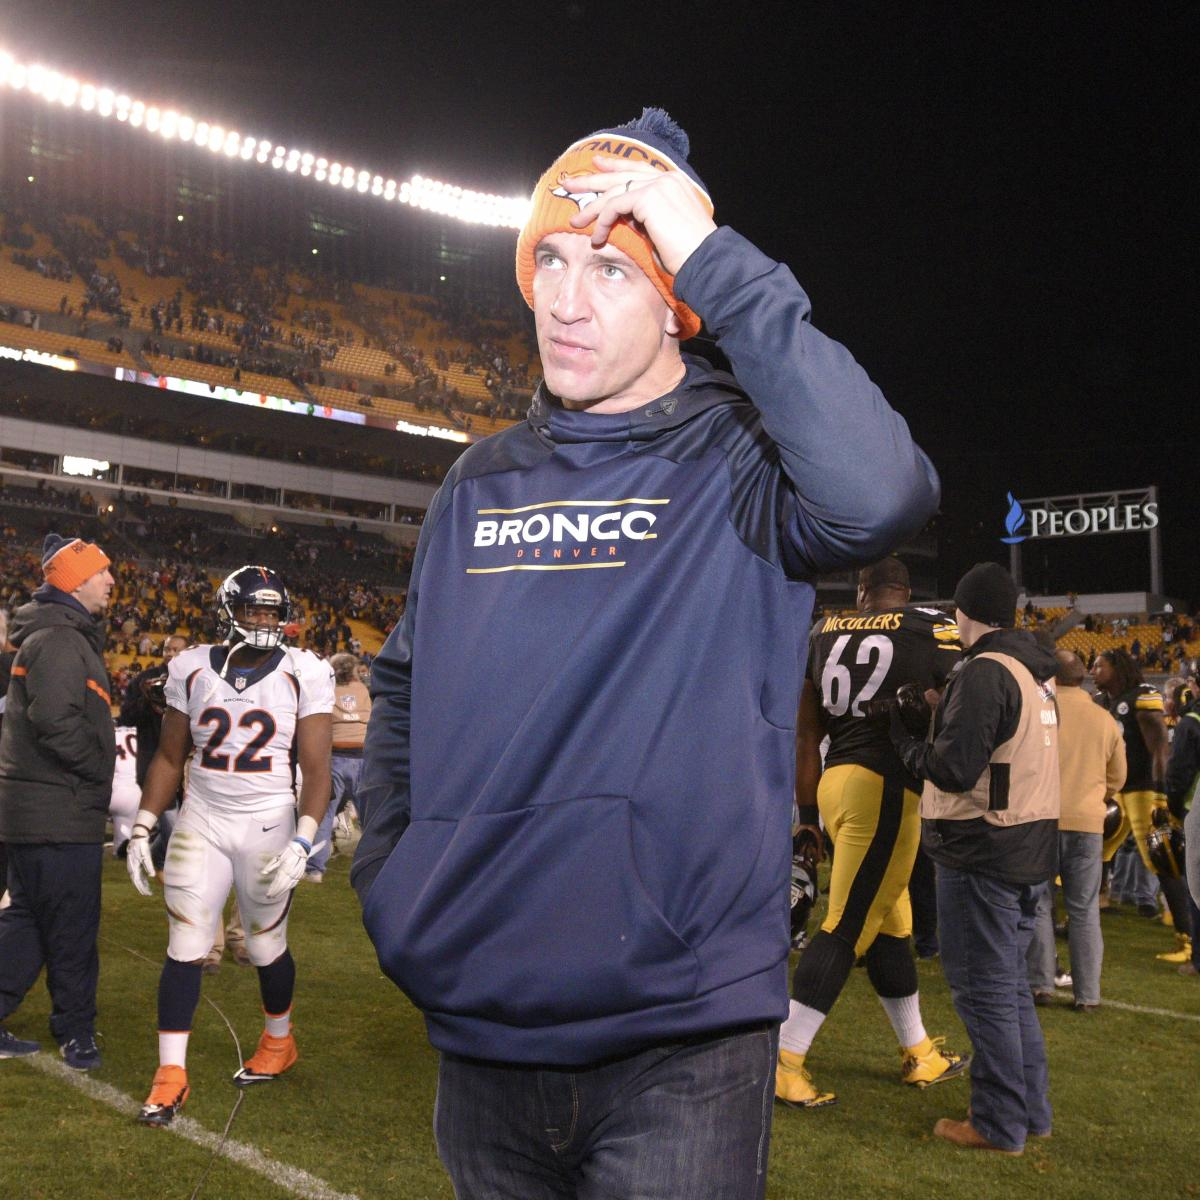 Peyton Manning Responds To Al Jazeera Doping Report On